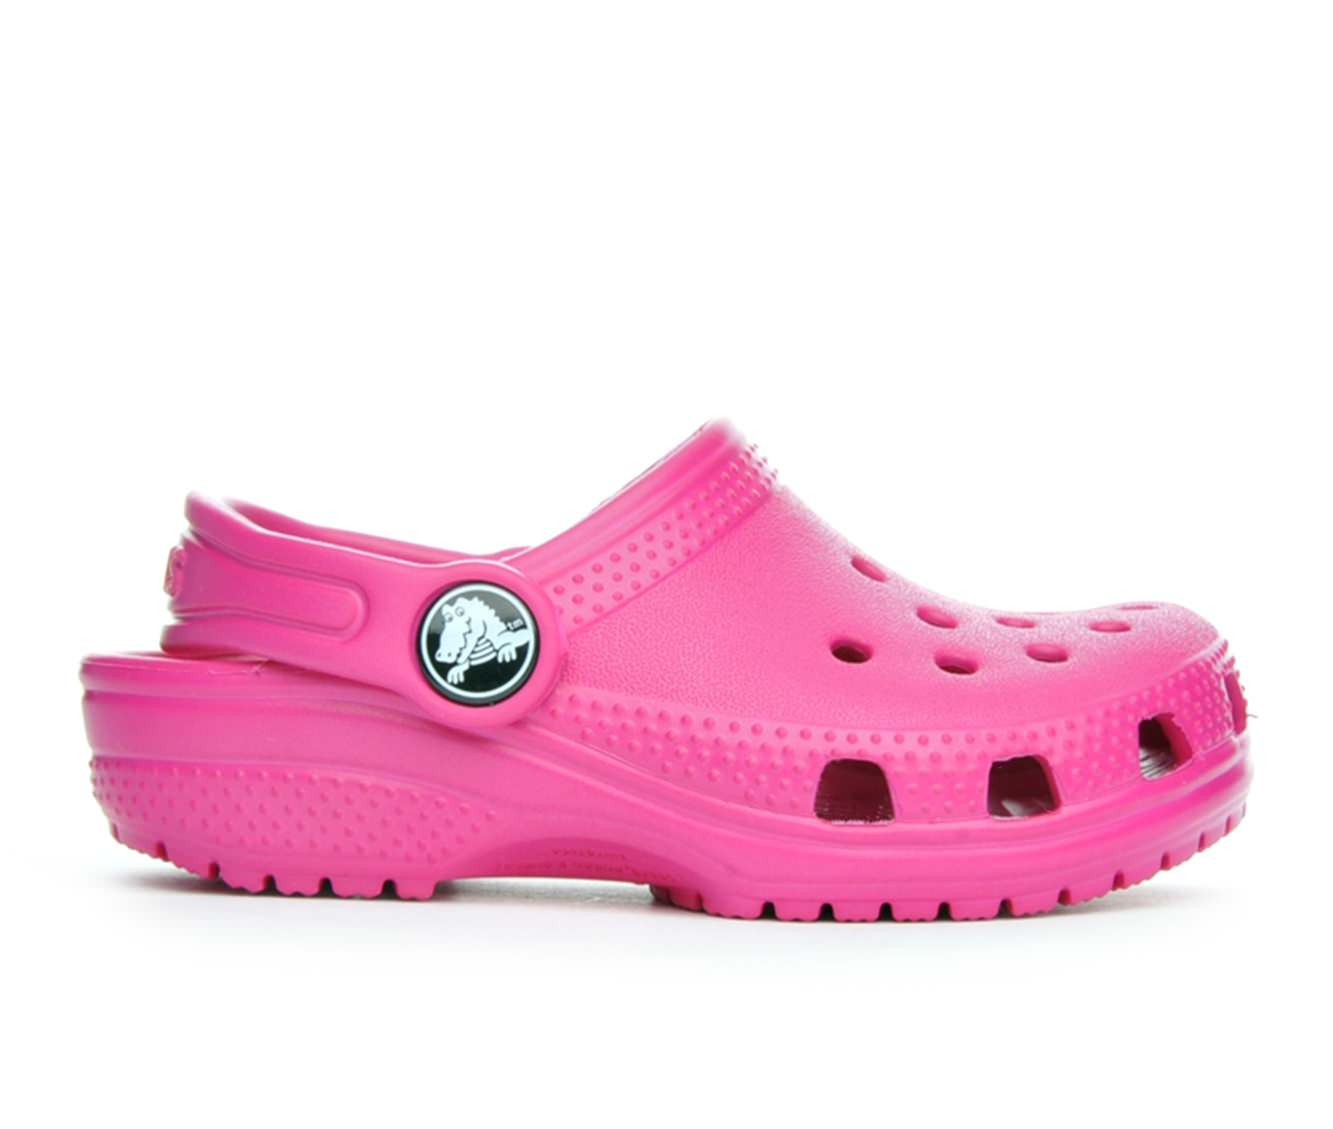 Girls' Crocs Infant Classic Clog Children's Shoes (Pink)